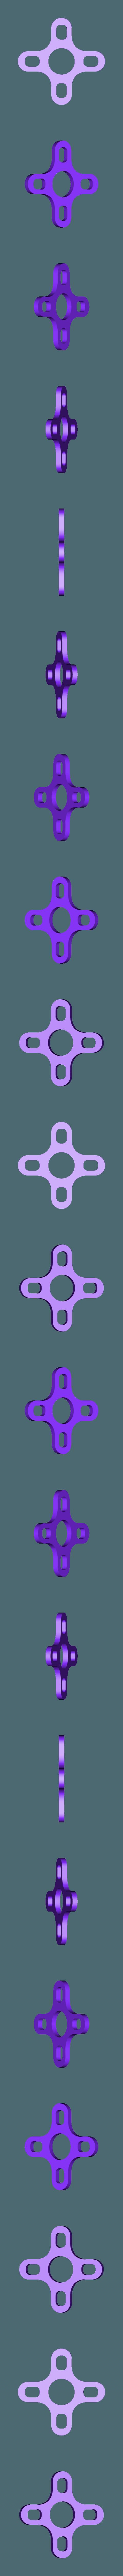 22XX_Soft_Mount_Pad.stl Download free STL file 11XX 22XX 14XX 13XX TPU Soft Mount Pads Quadcopter Vibration Dampener Every Size • 3D printing design, BananaScience